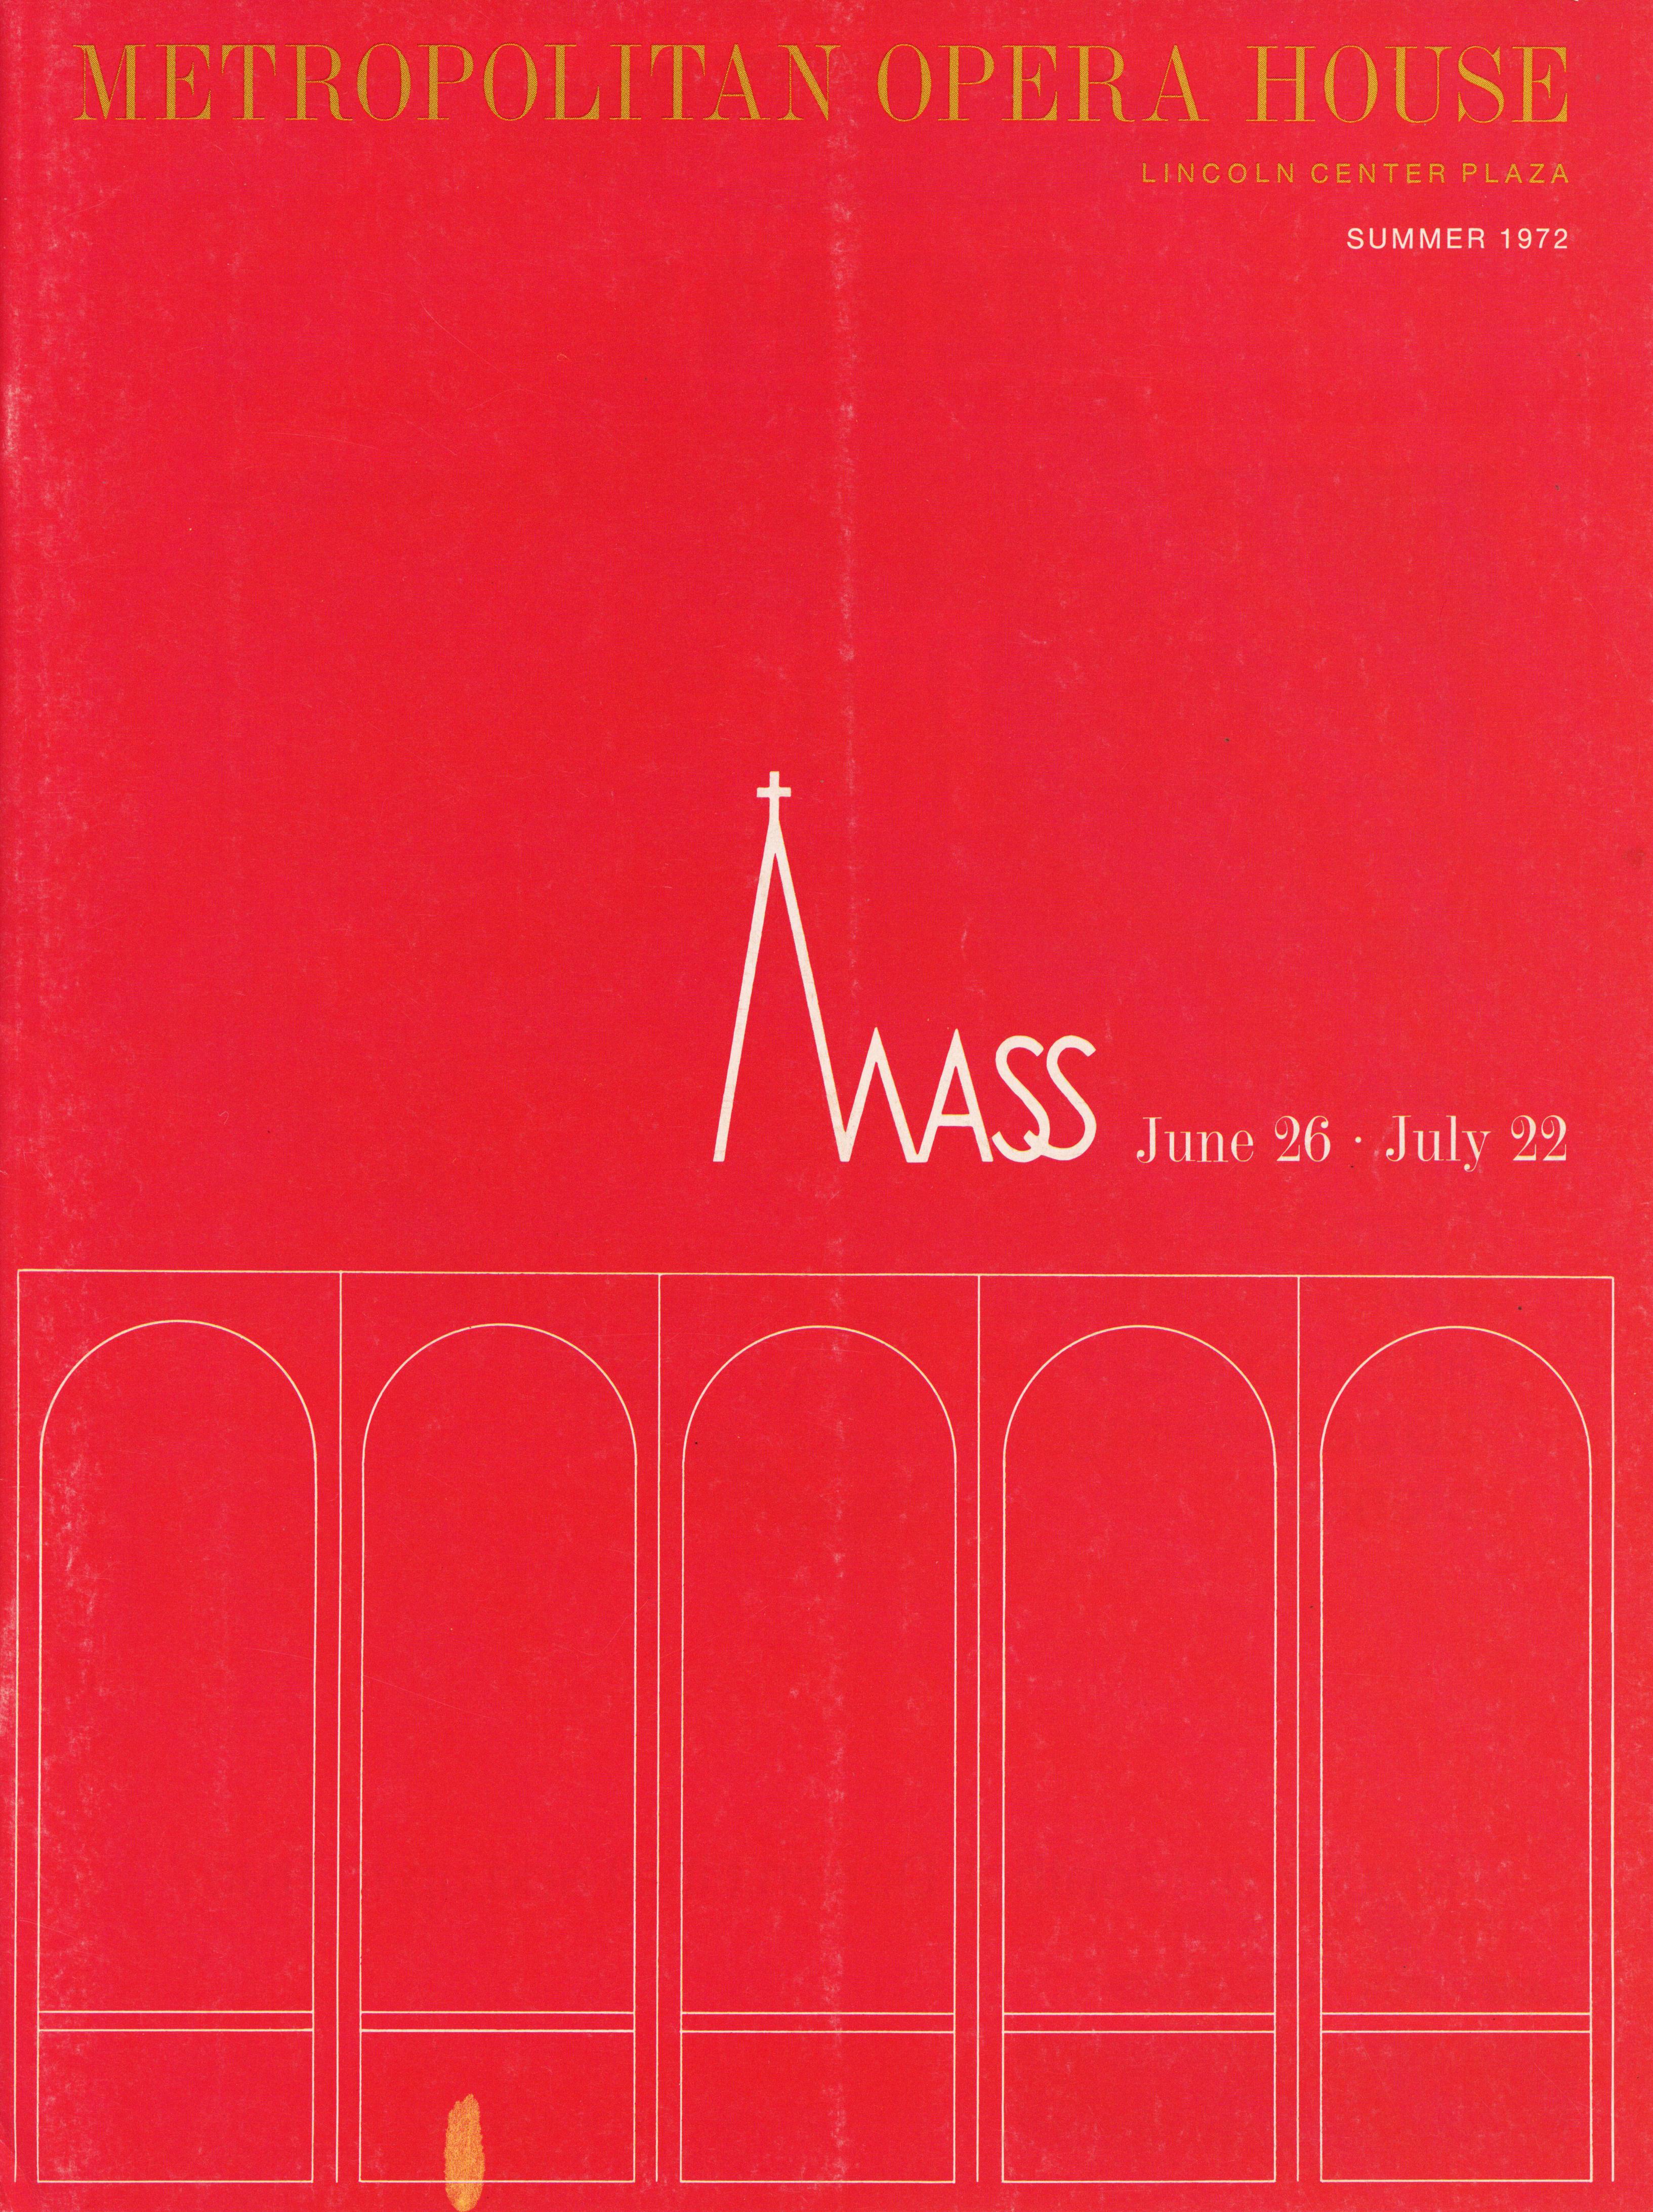 Bernstein_Mass_program_MET_Opera_1972